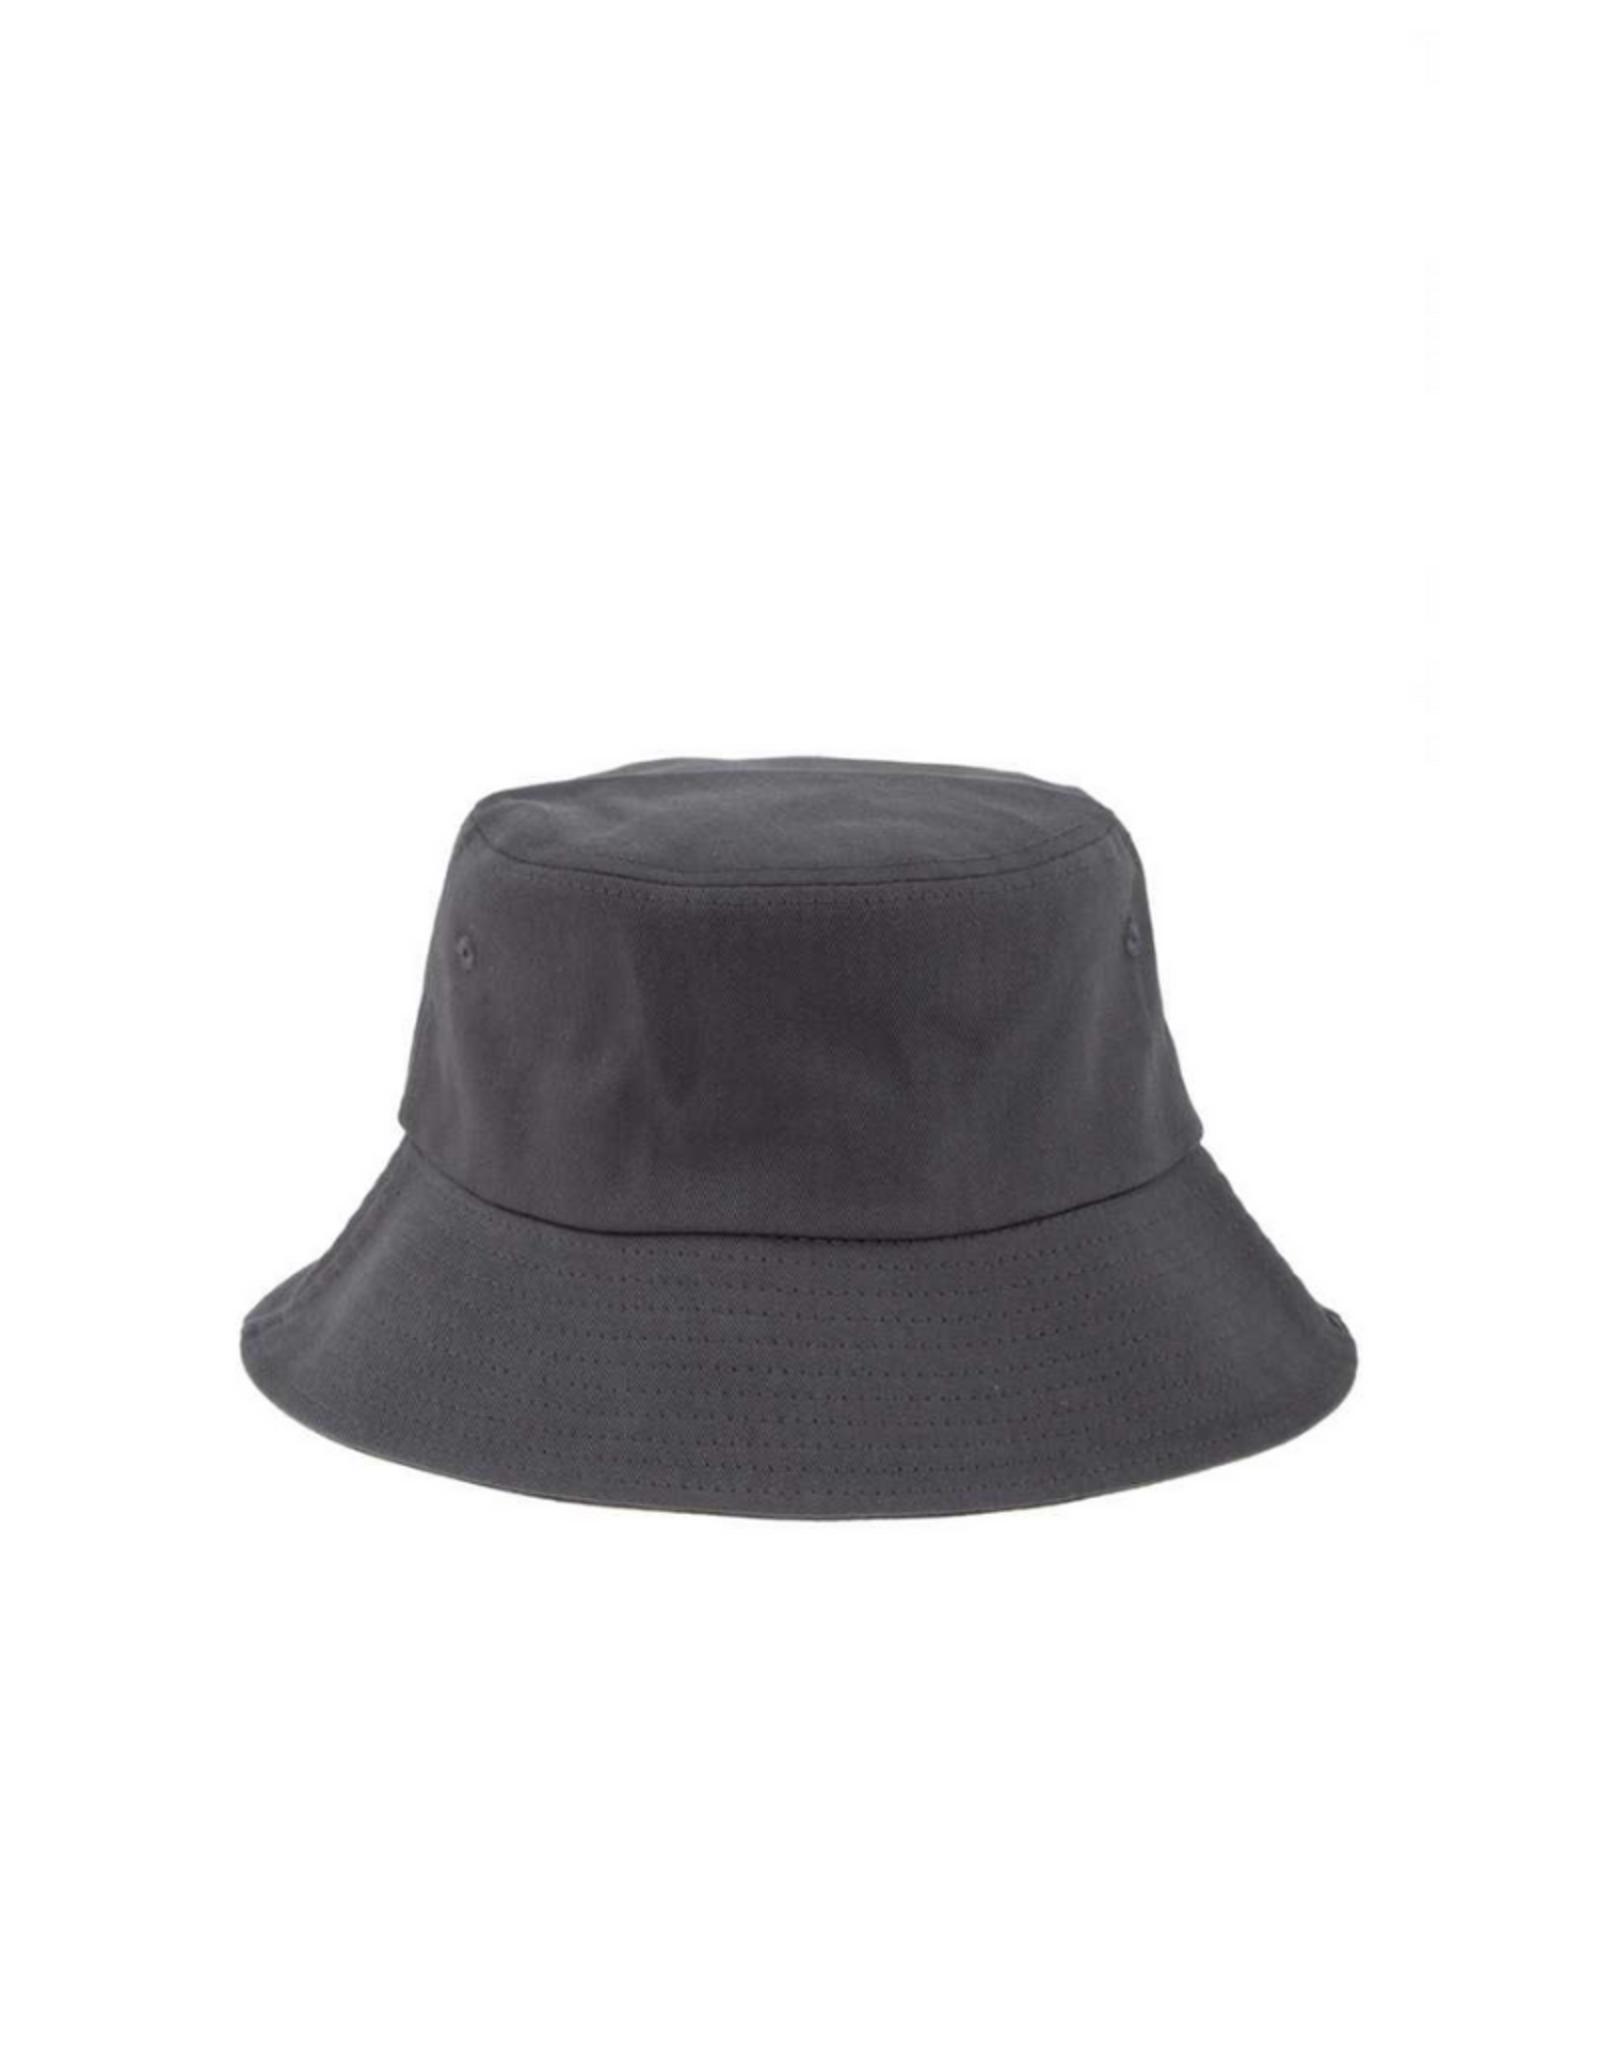 HAT-BUCKET DARK GREY